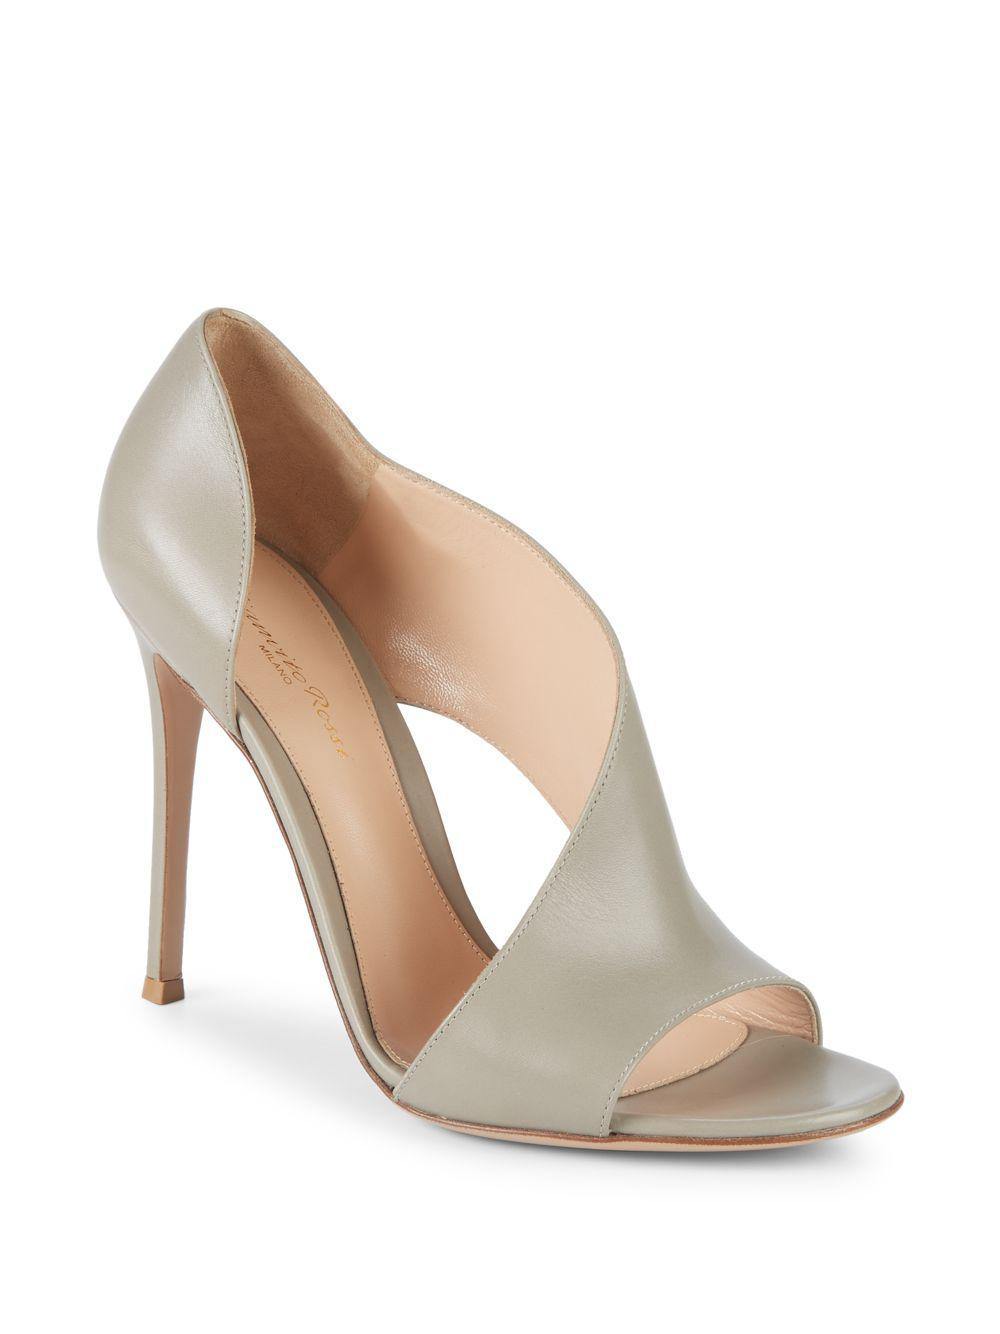 d7dc53f86c8e Lyst - Gianvito Rossi Leather Cutout Sandals in Gray